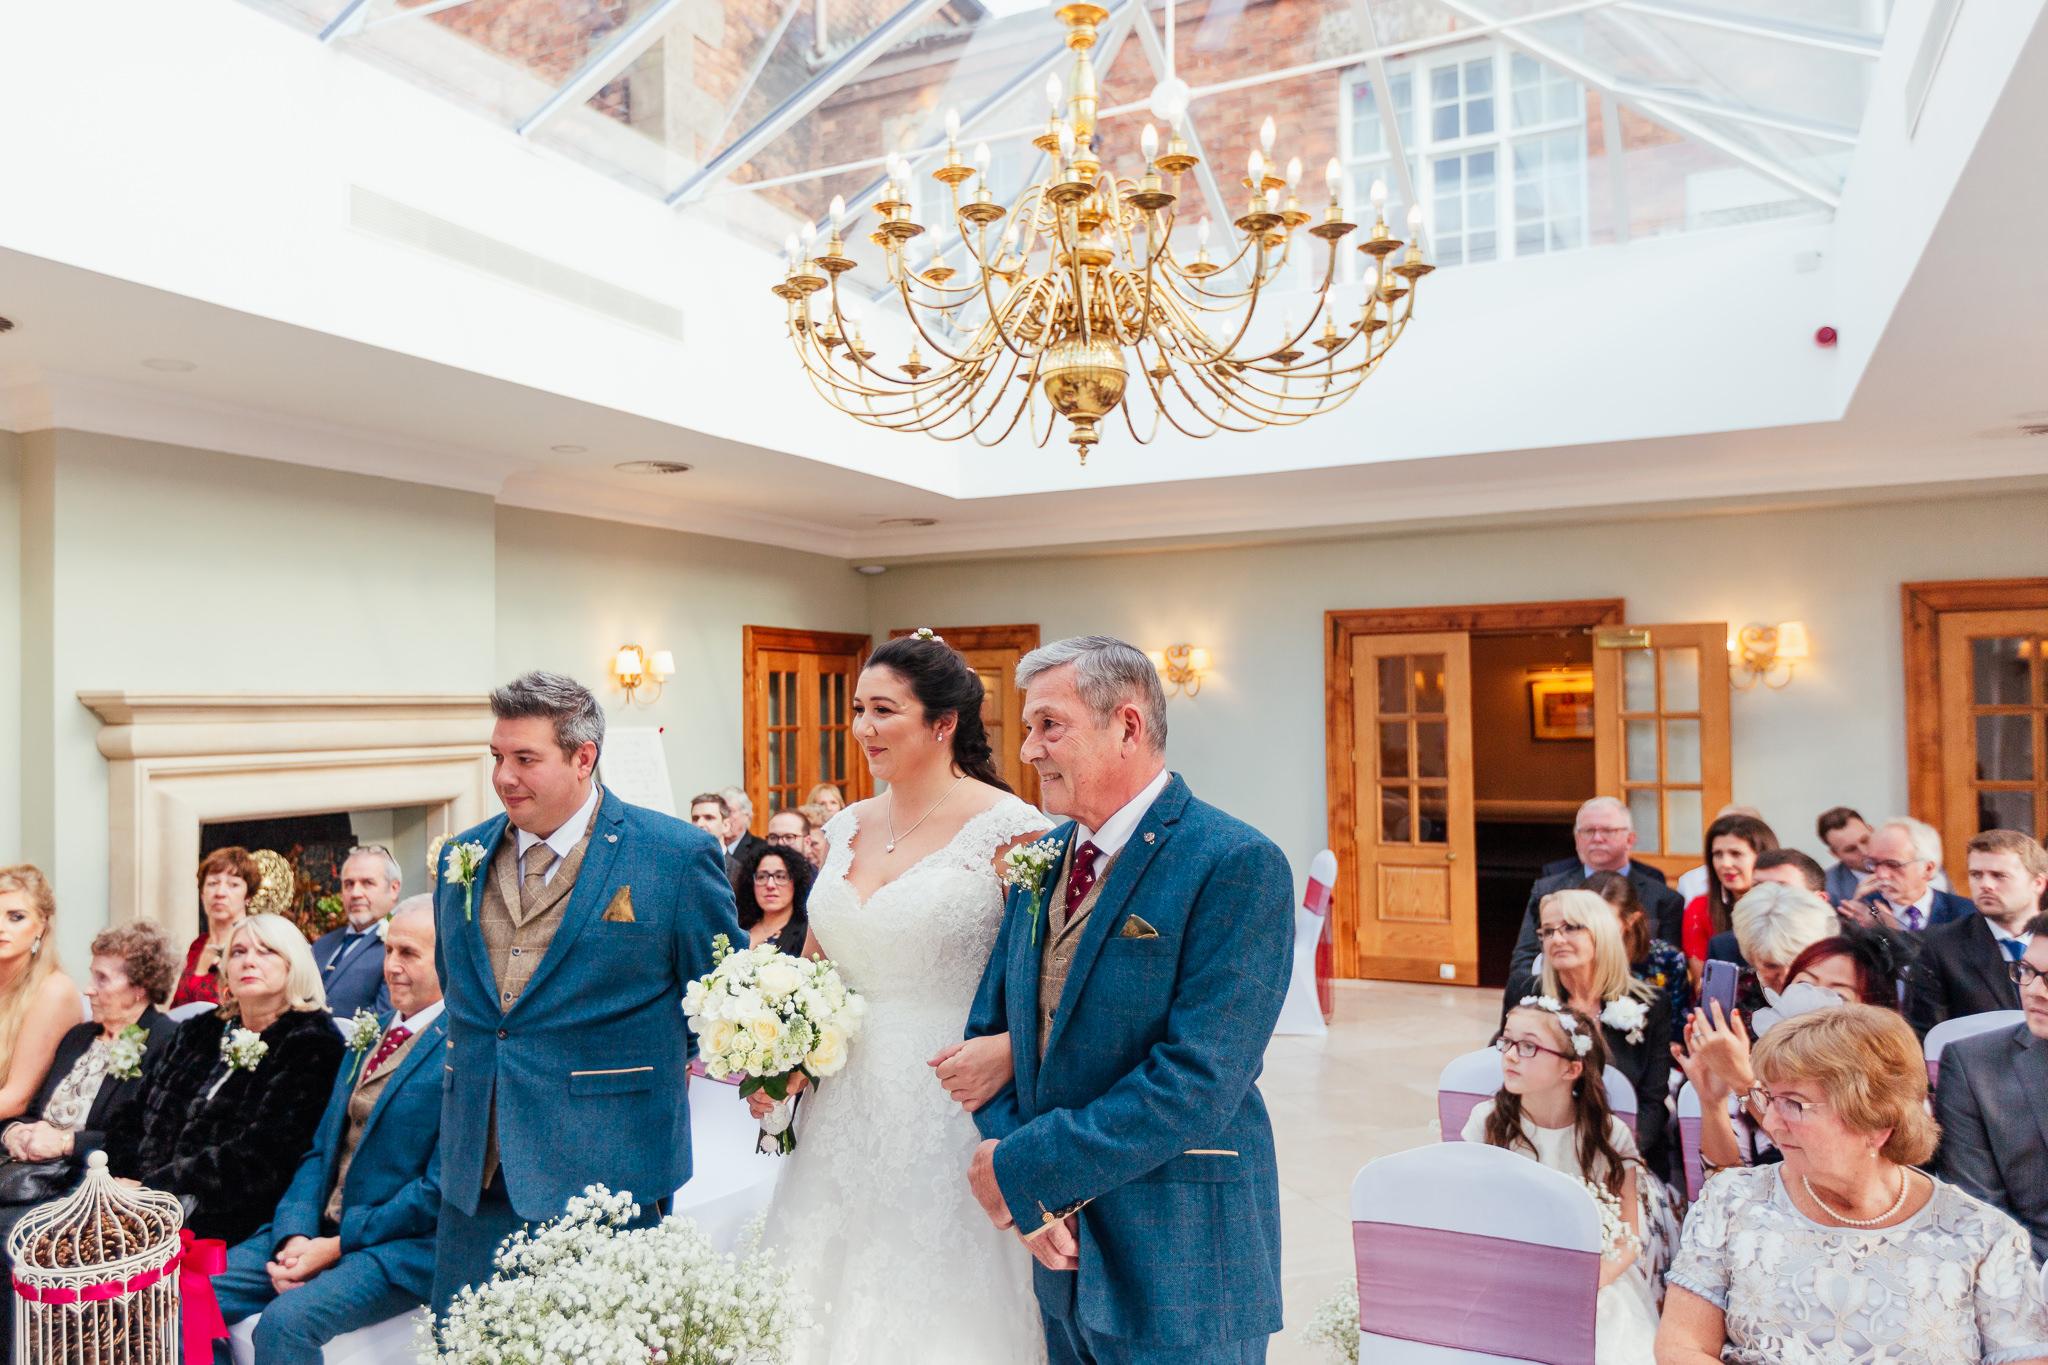 Willington-Hall-Cheshire-Wedding-14.jpg